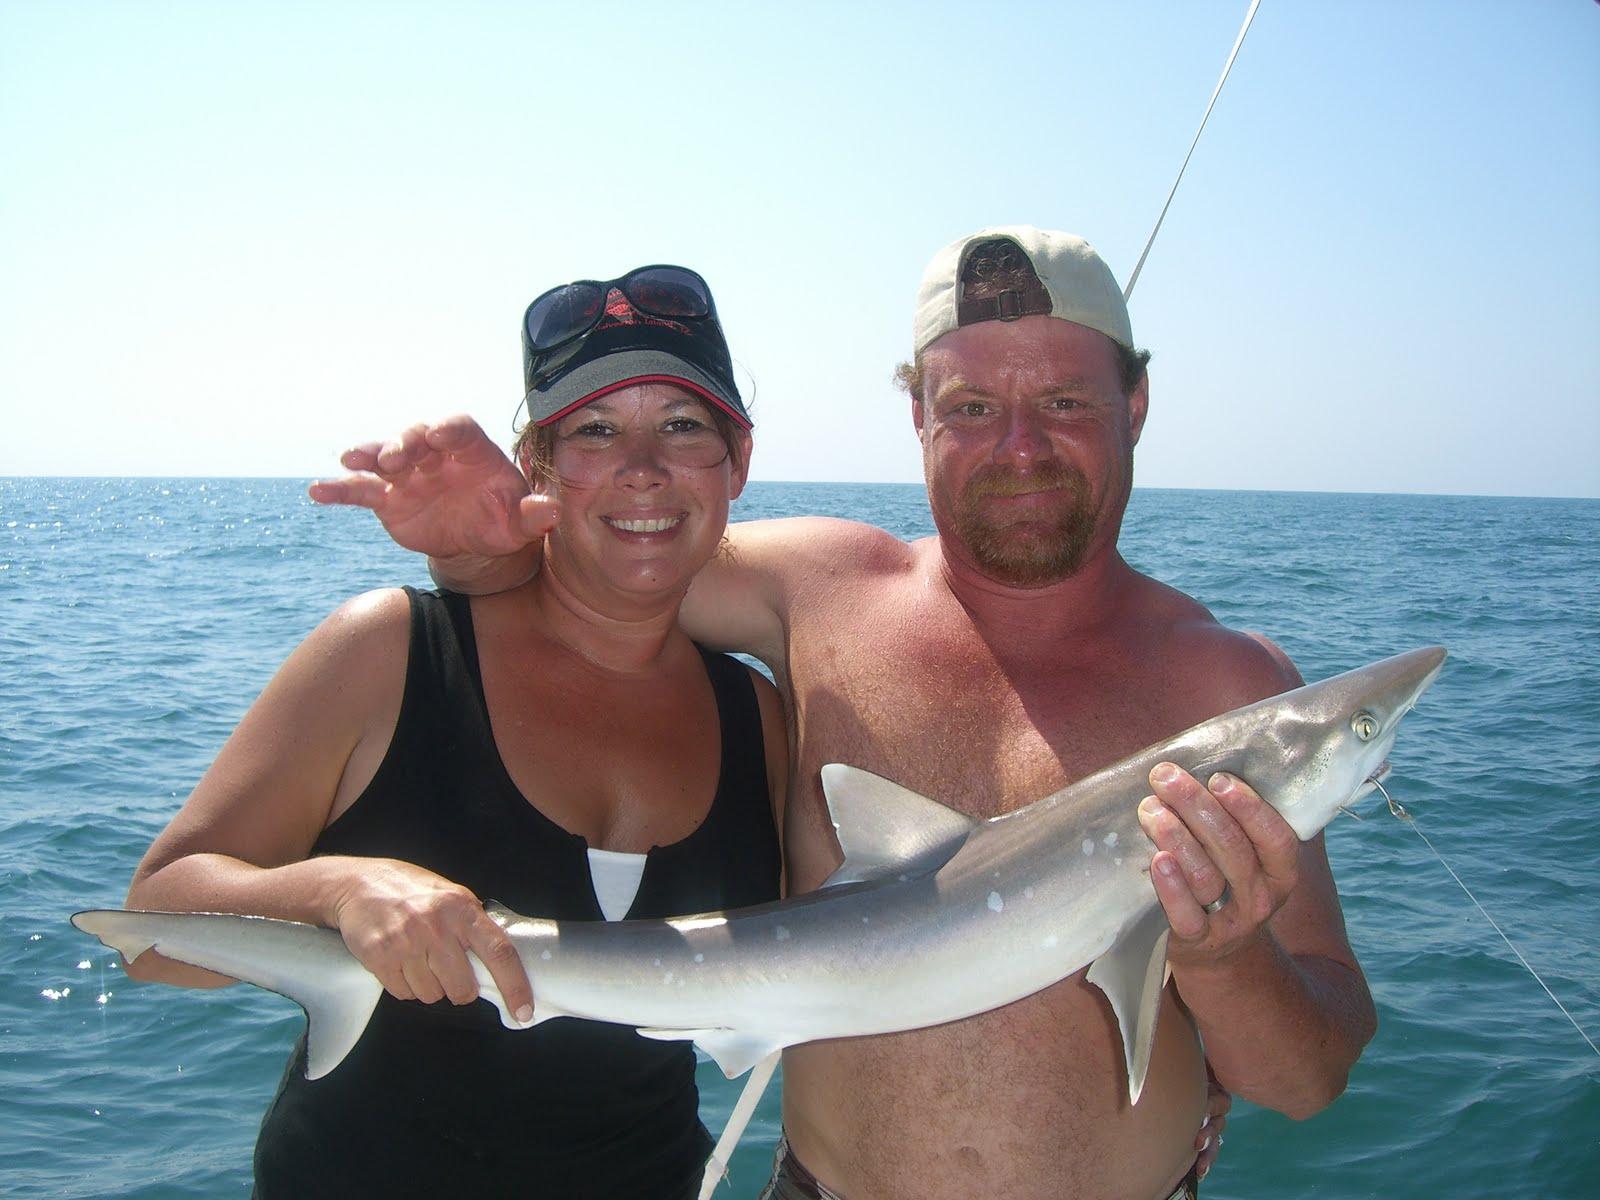 Galveston bay texas and sabine lake fishing reports 08 28 for Texas fishing reports